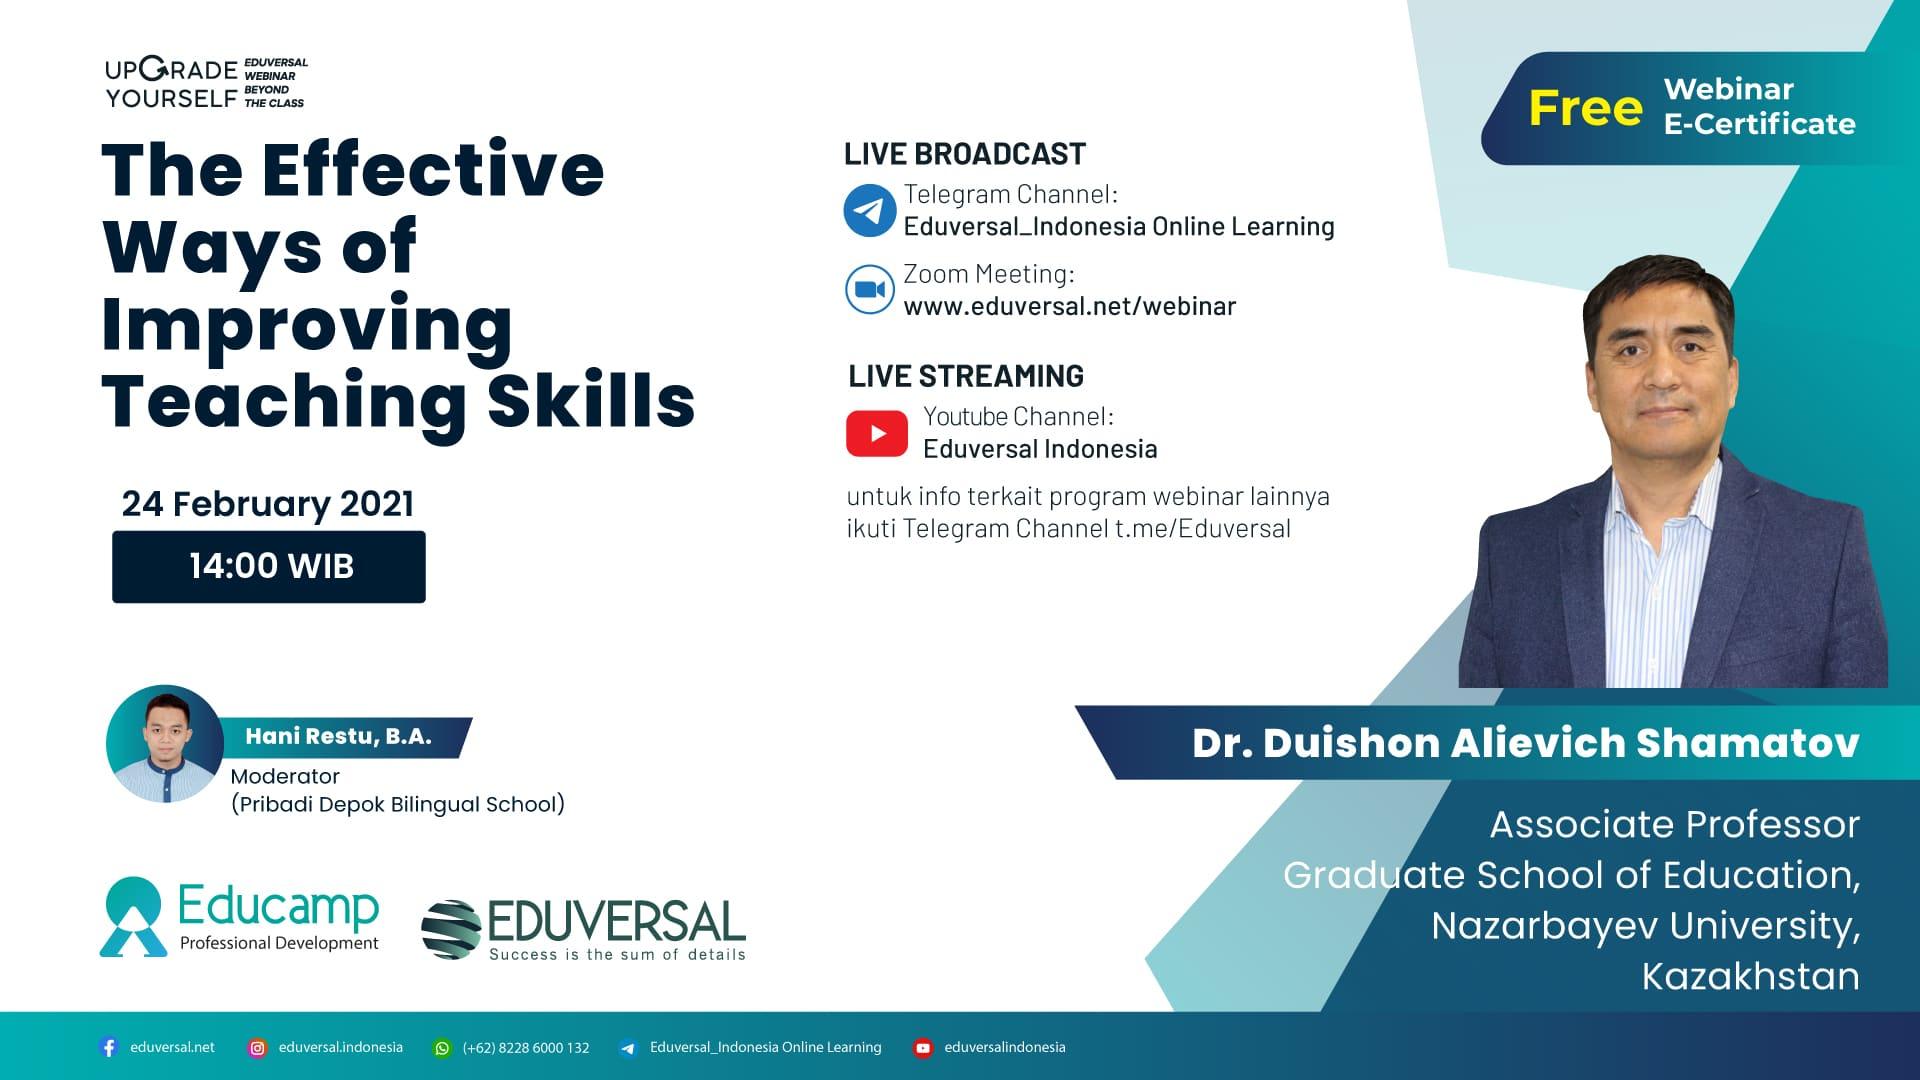 The Effective Ways of Improving Teaching Skills